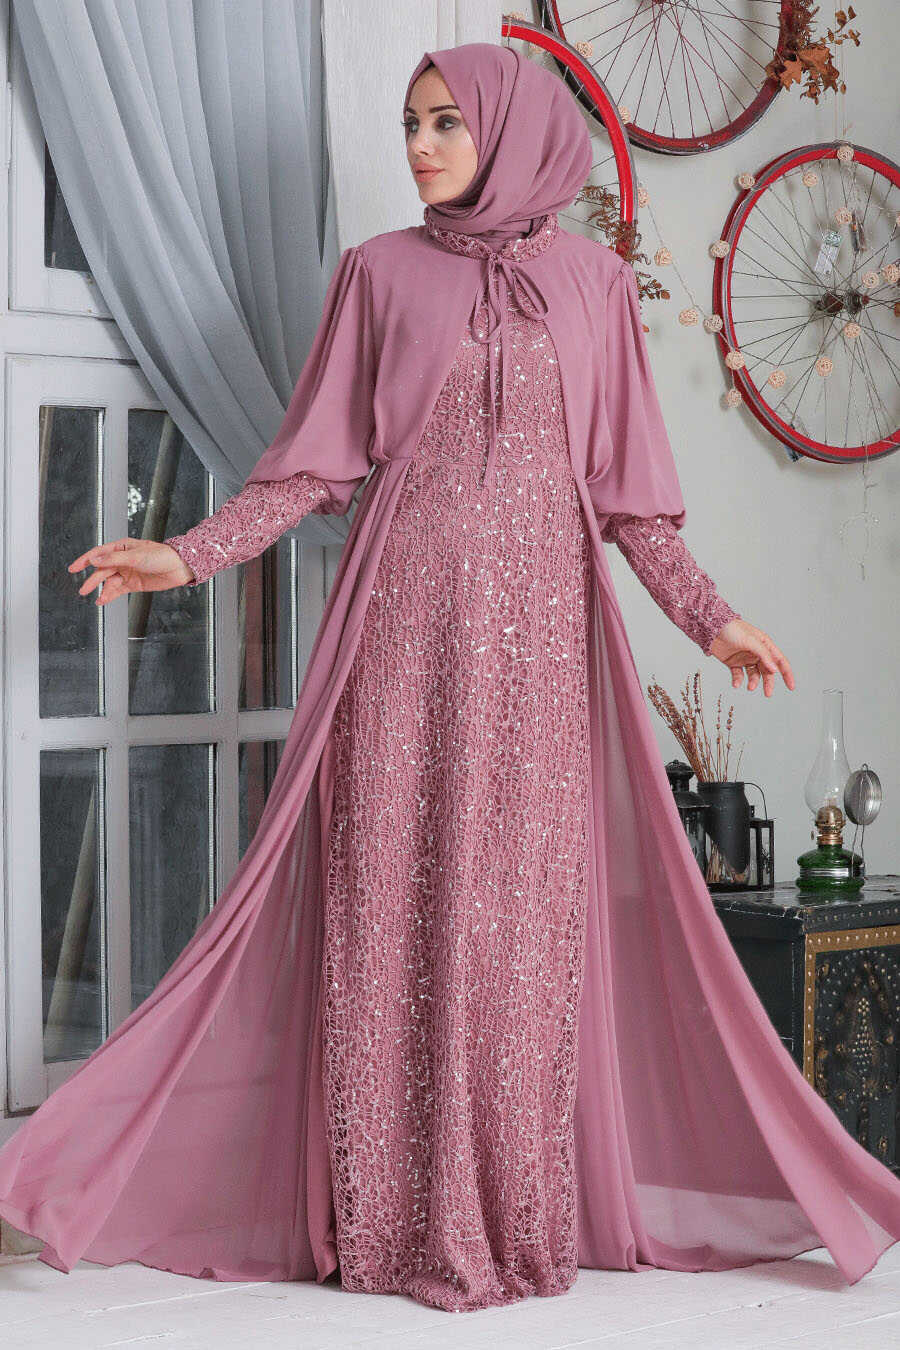 Dusty Rose Hijab Evening Dress 50090GK